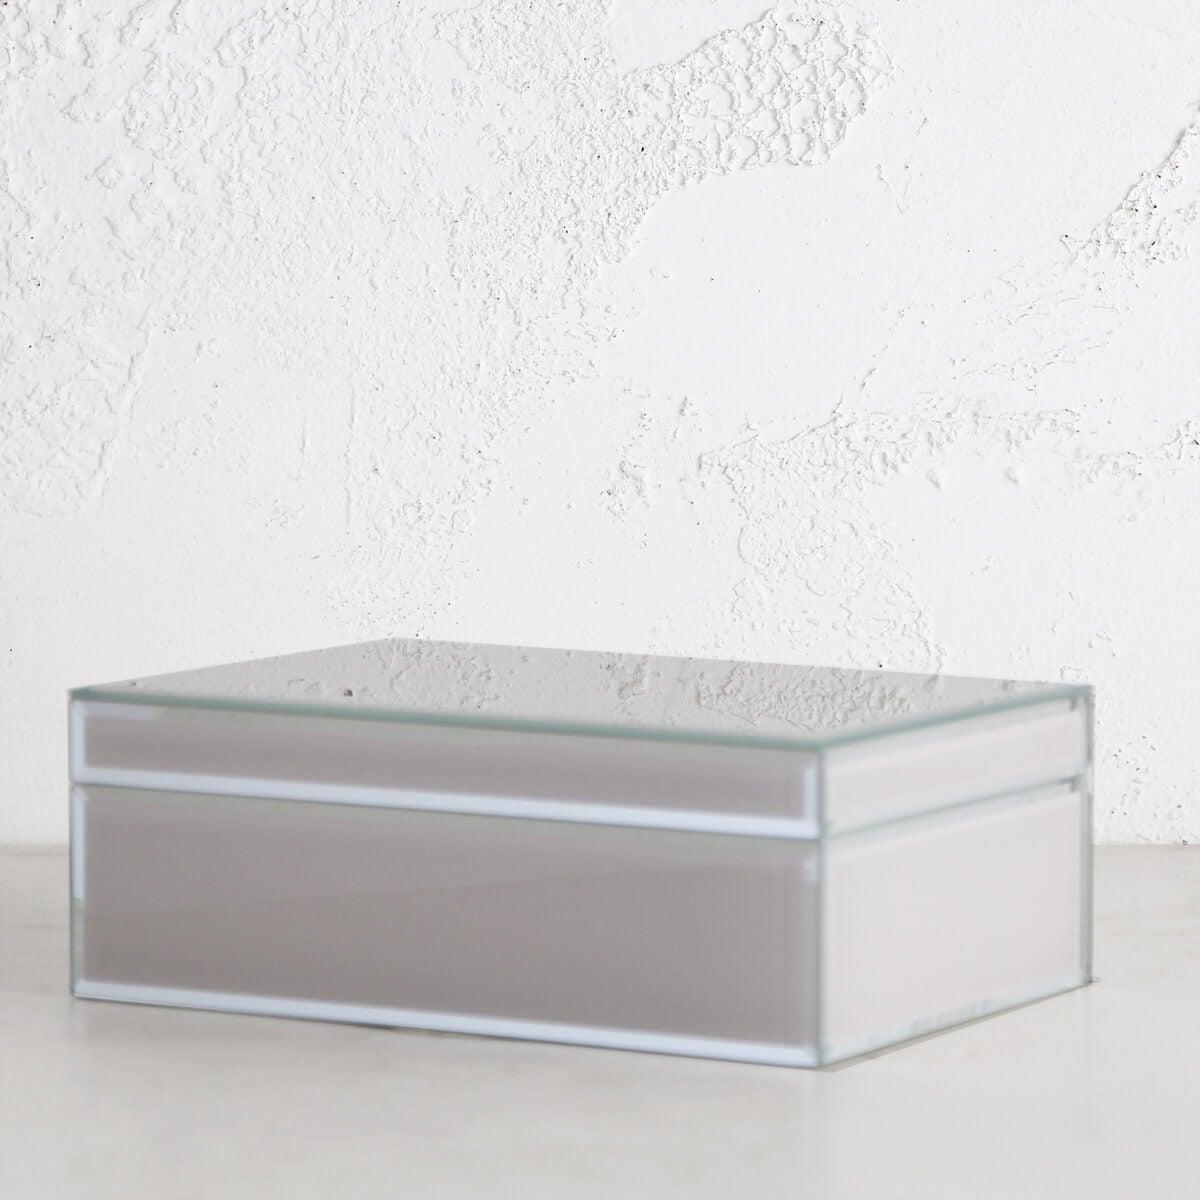 ONE SIX EIGHT LONDON - SARA GLASS JEWELLERY BOX - NUDE LARGE